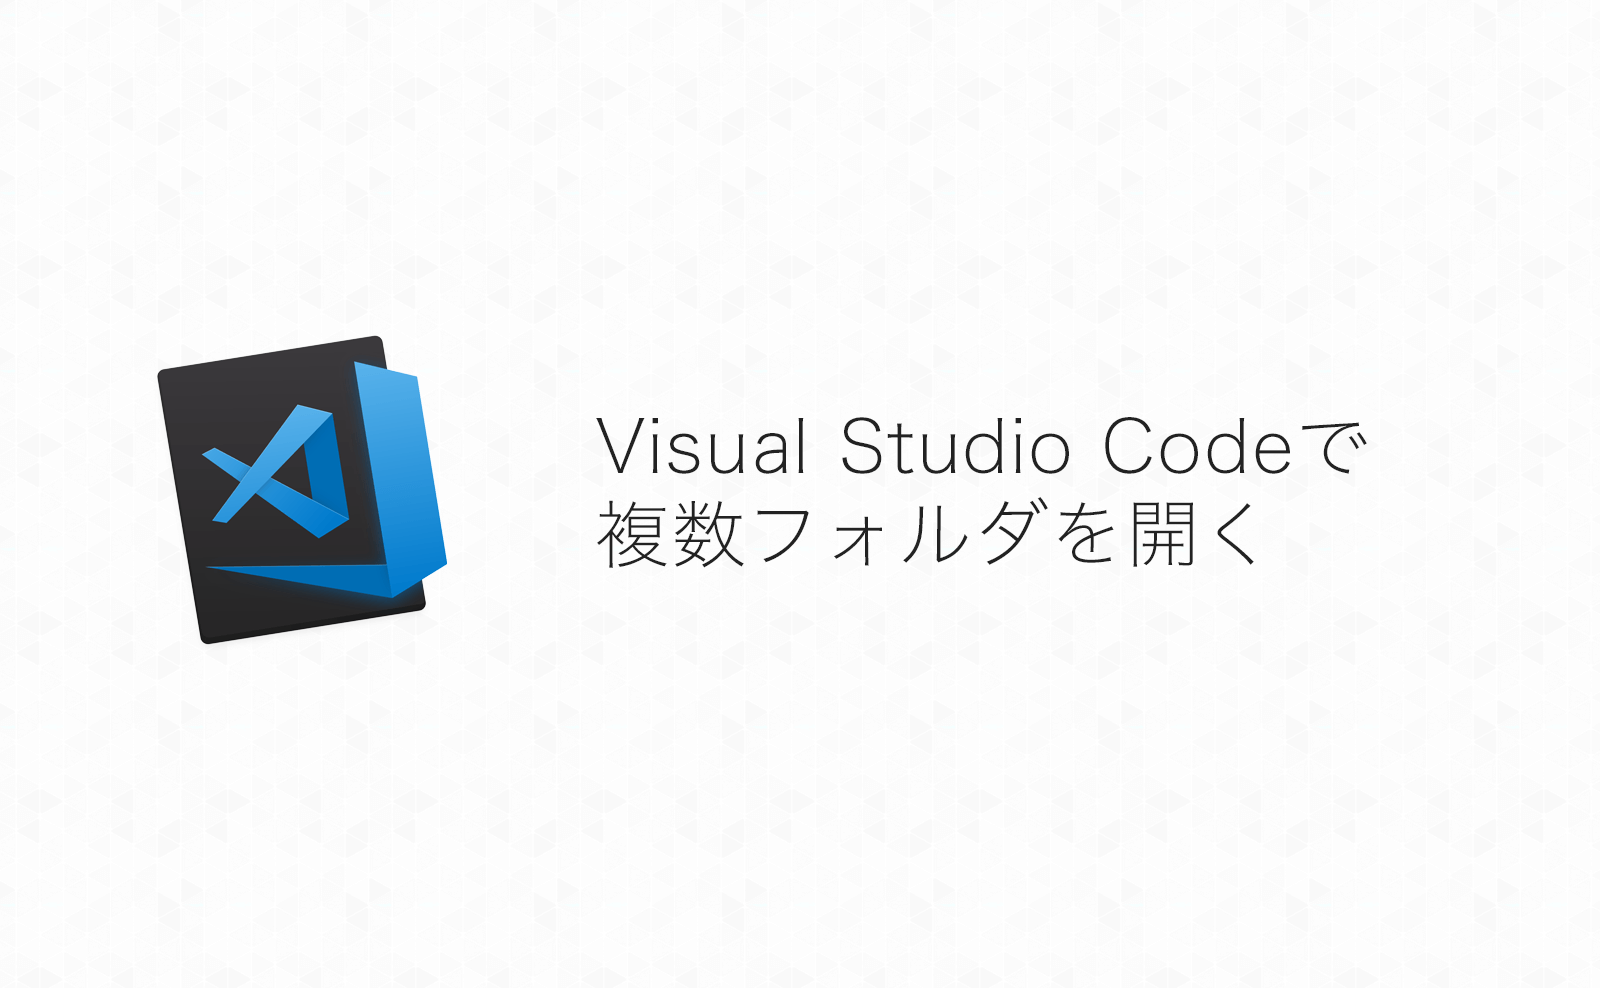 Visual Studio Codeで複数フォルダをまとめて開く方法